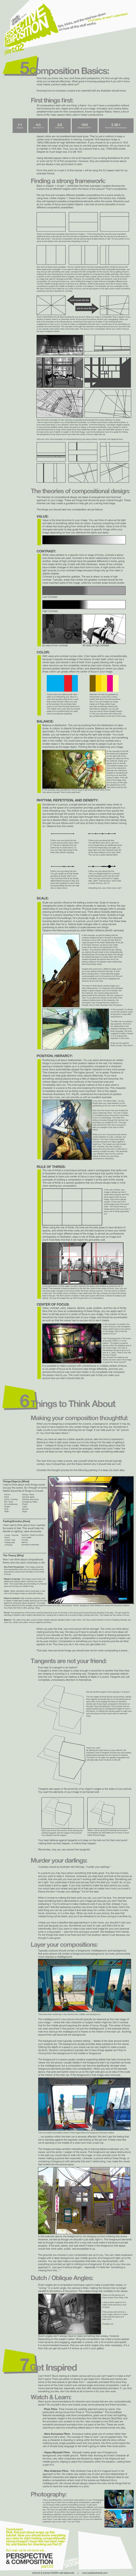 Perspective + Composition Pt.2 by fox-orian.deviantart.com on @deviantART